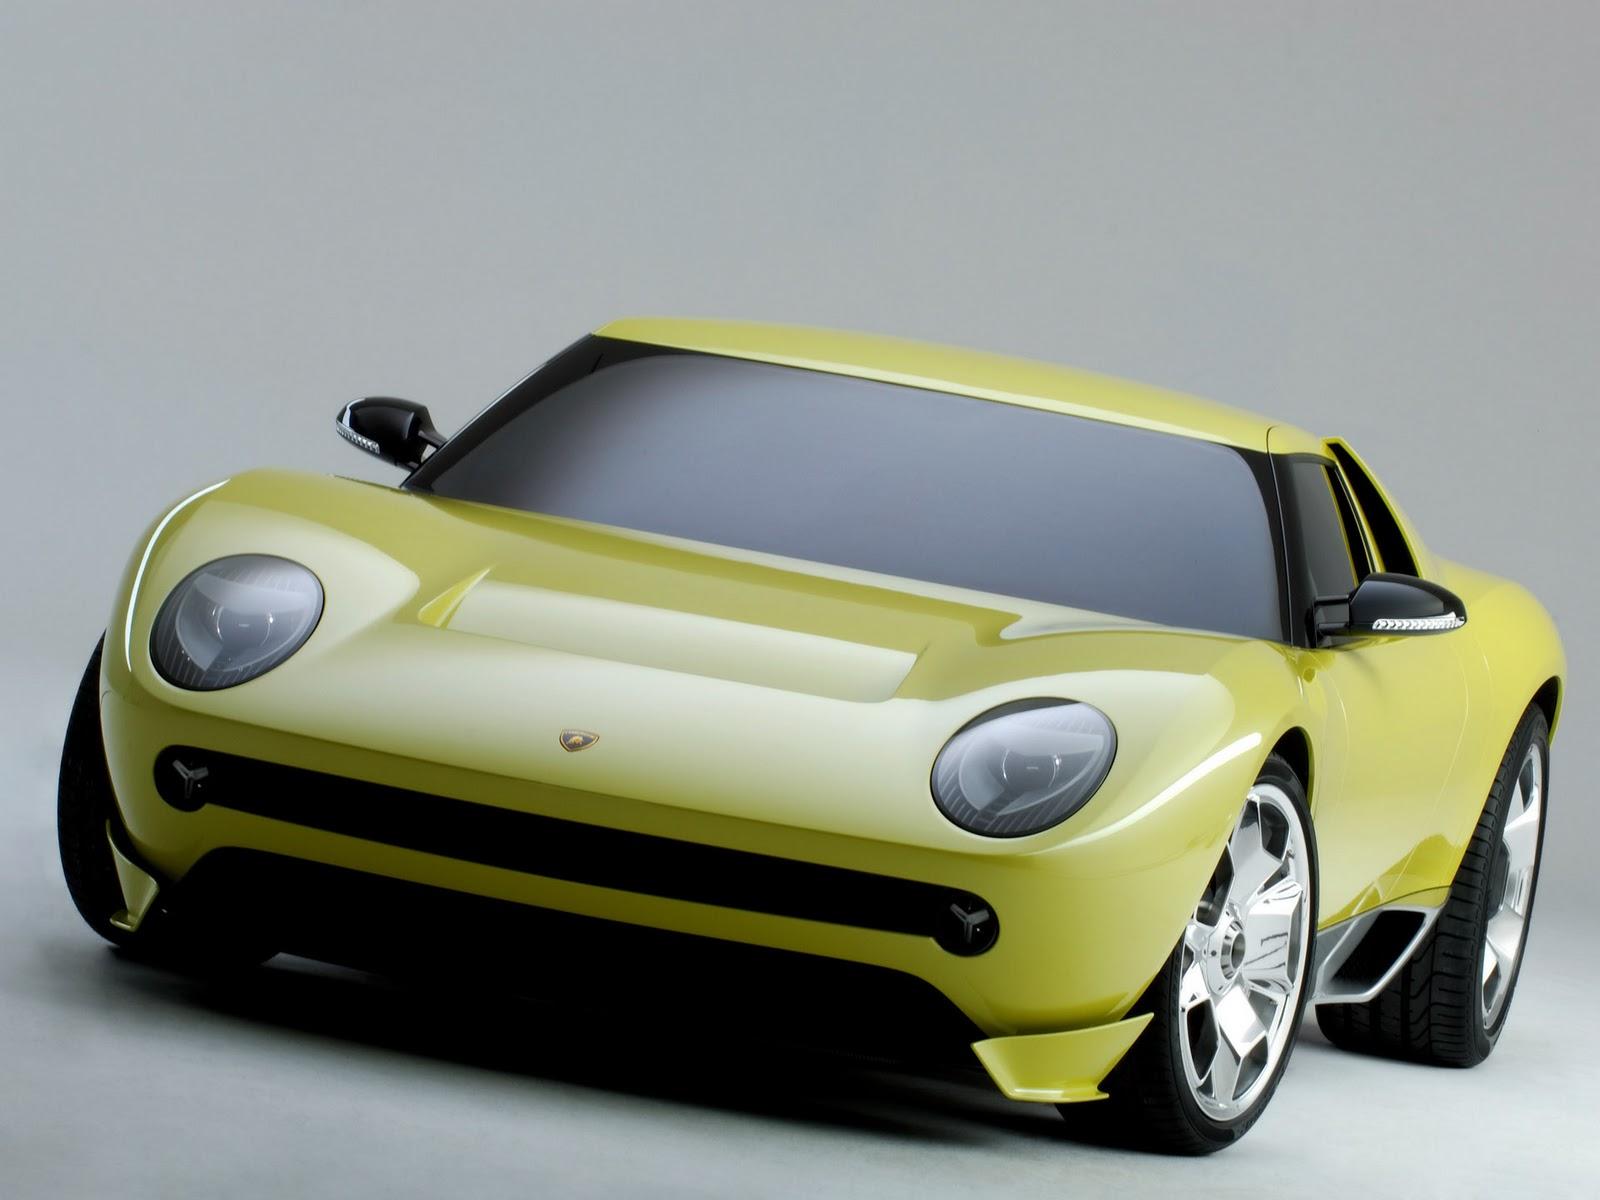 Informoose World S Most Expensive Cars Lamborghini Miura